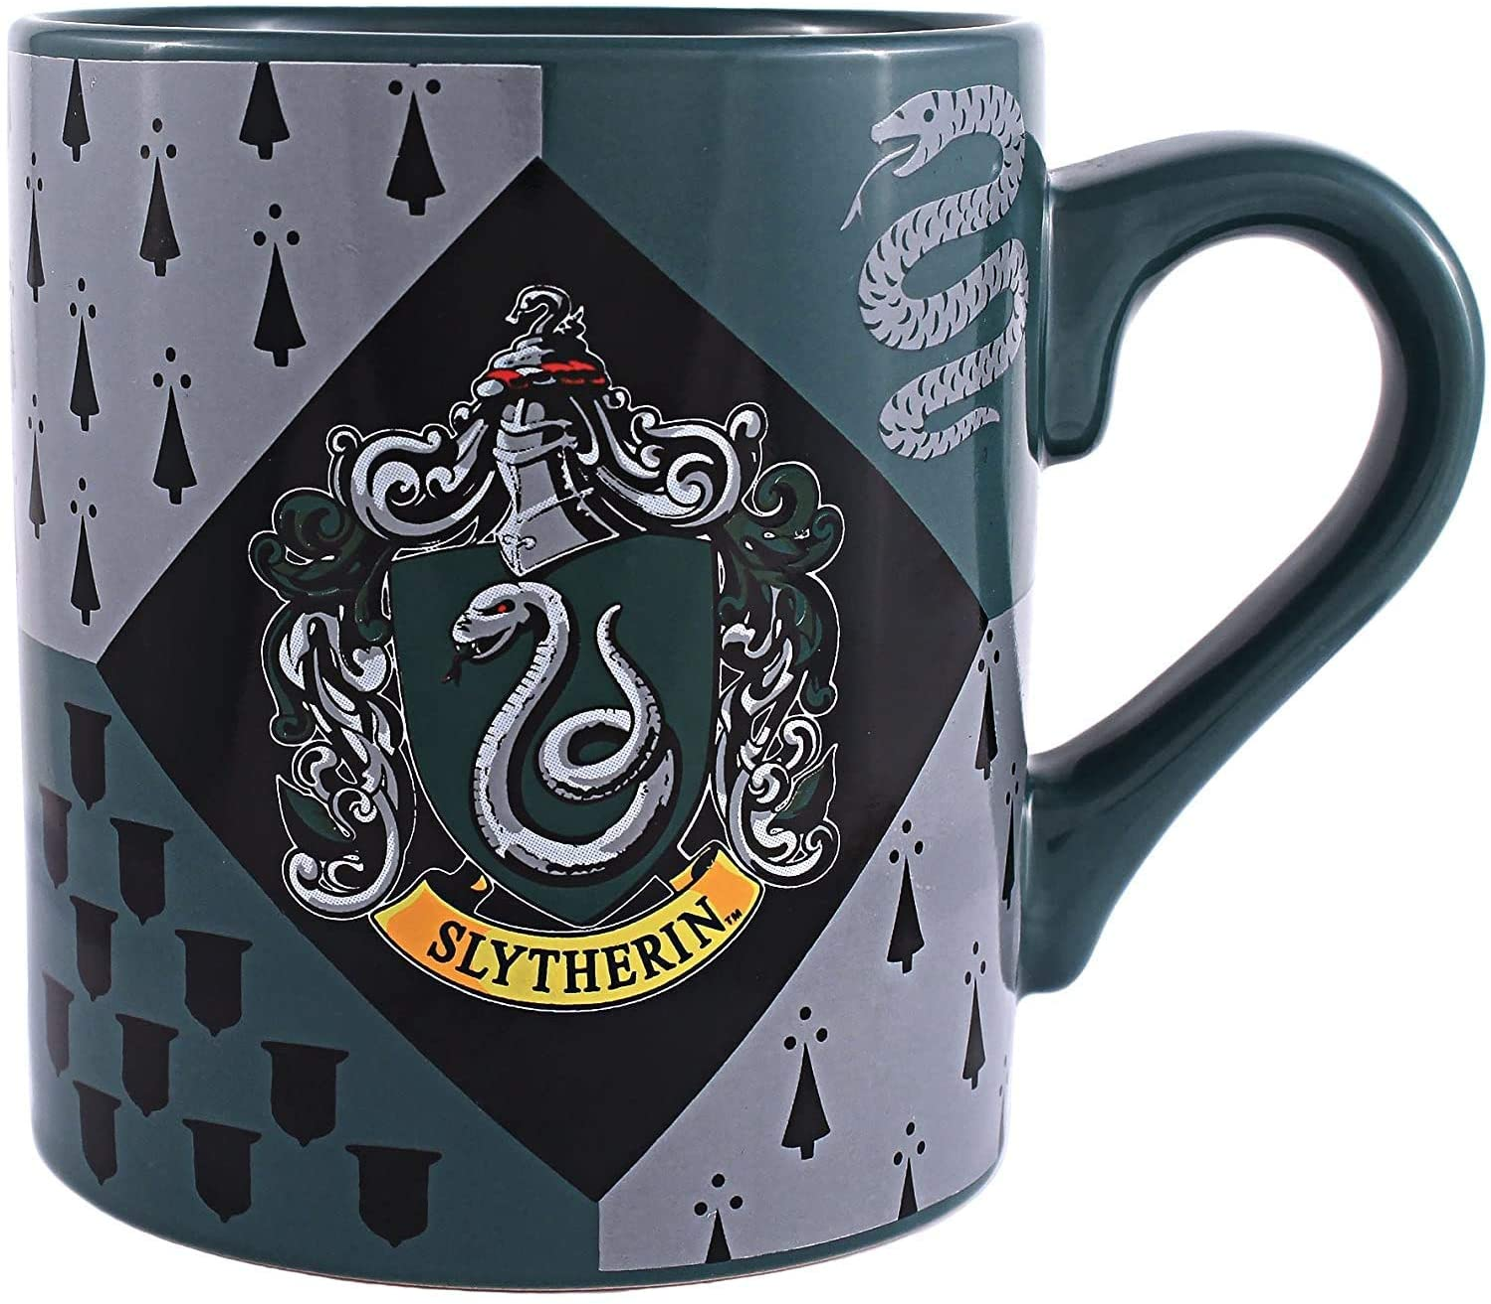 NEW Morphing Mugs Harry Heat Reveal Mugs Hogwarts Crest Teen Adult Collector